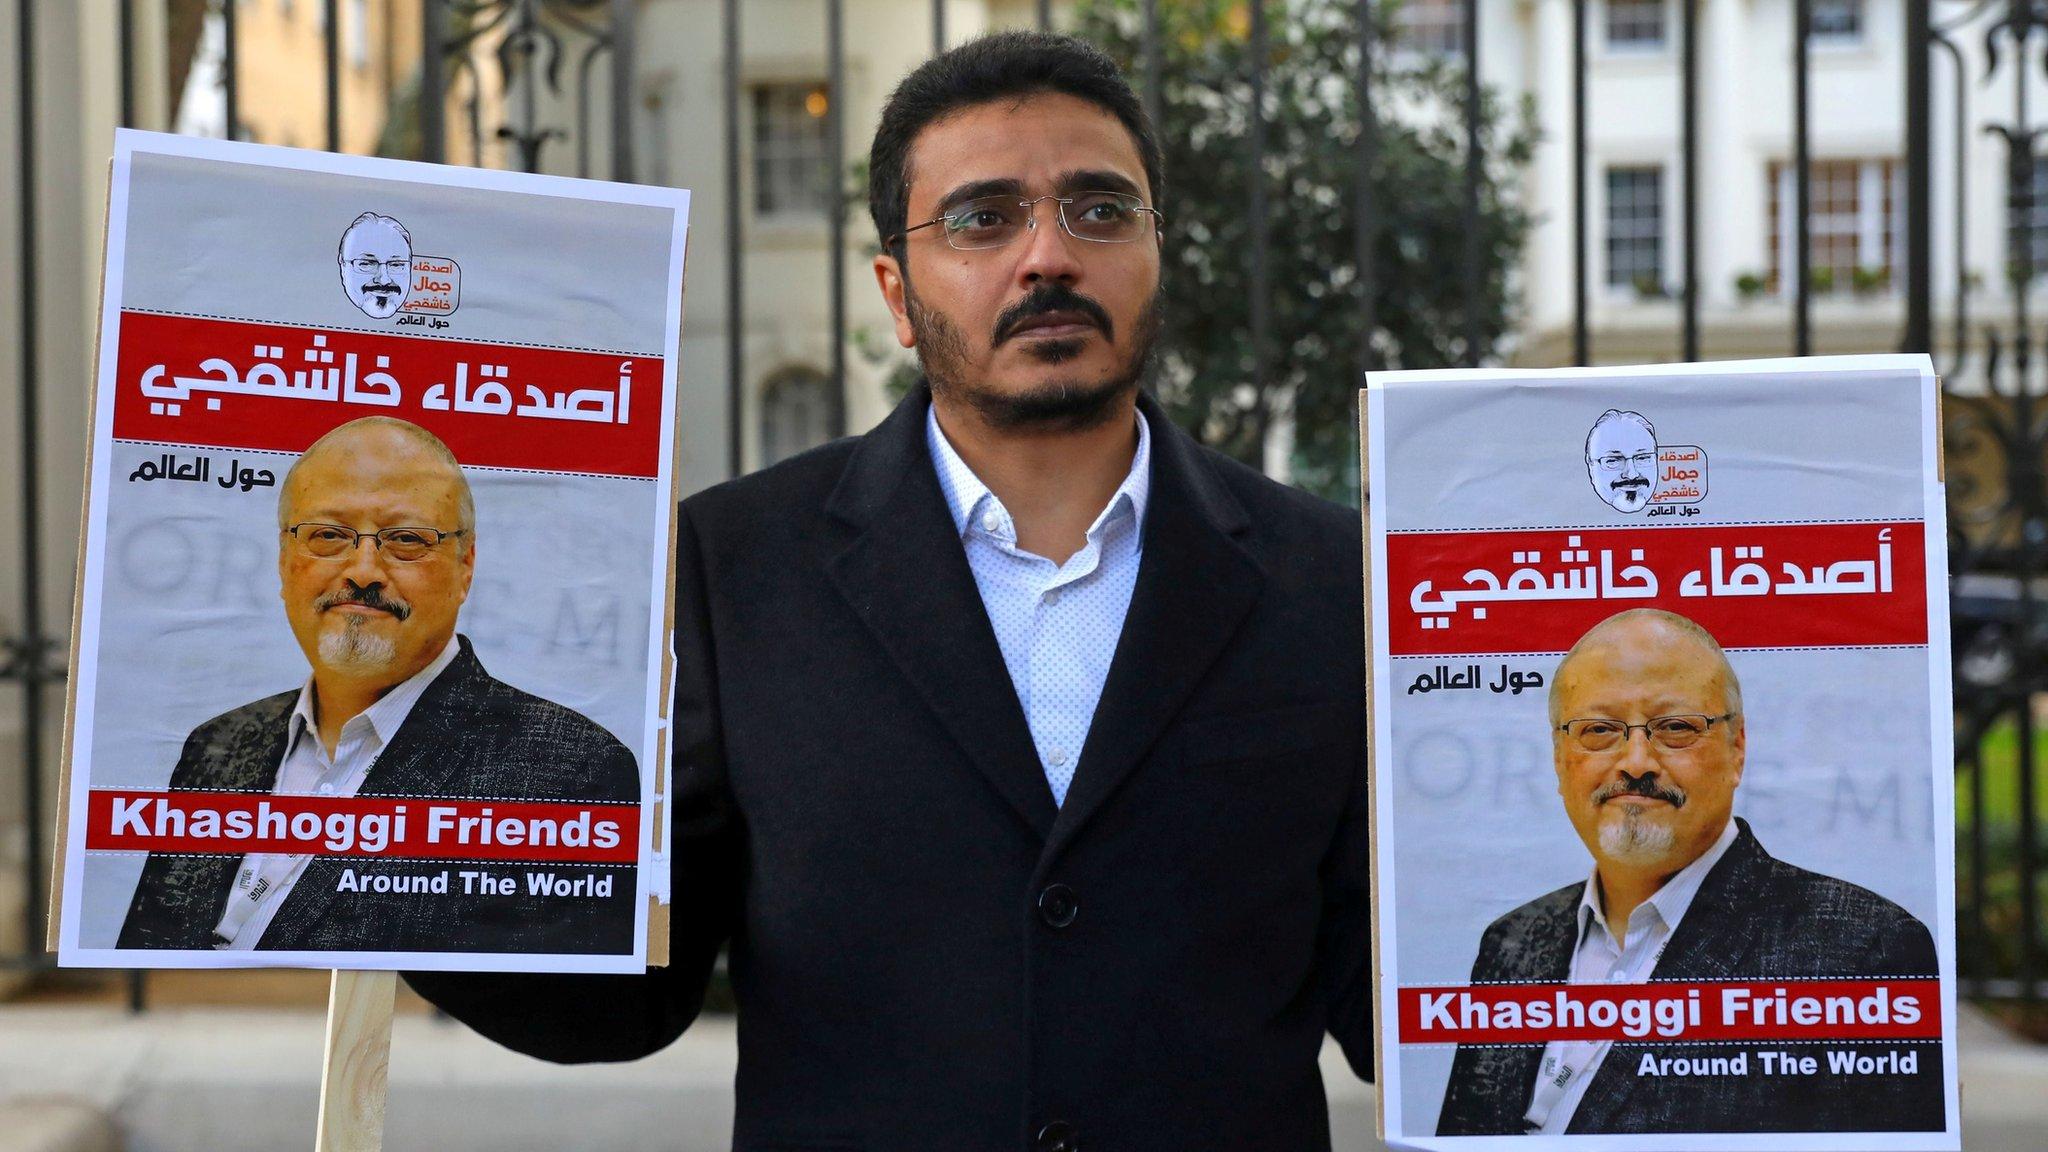 Jamal Khashoggi murder ordered by agent - Saudi prosecutor